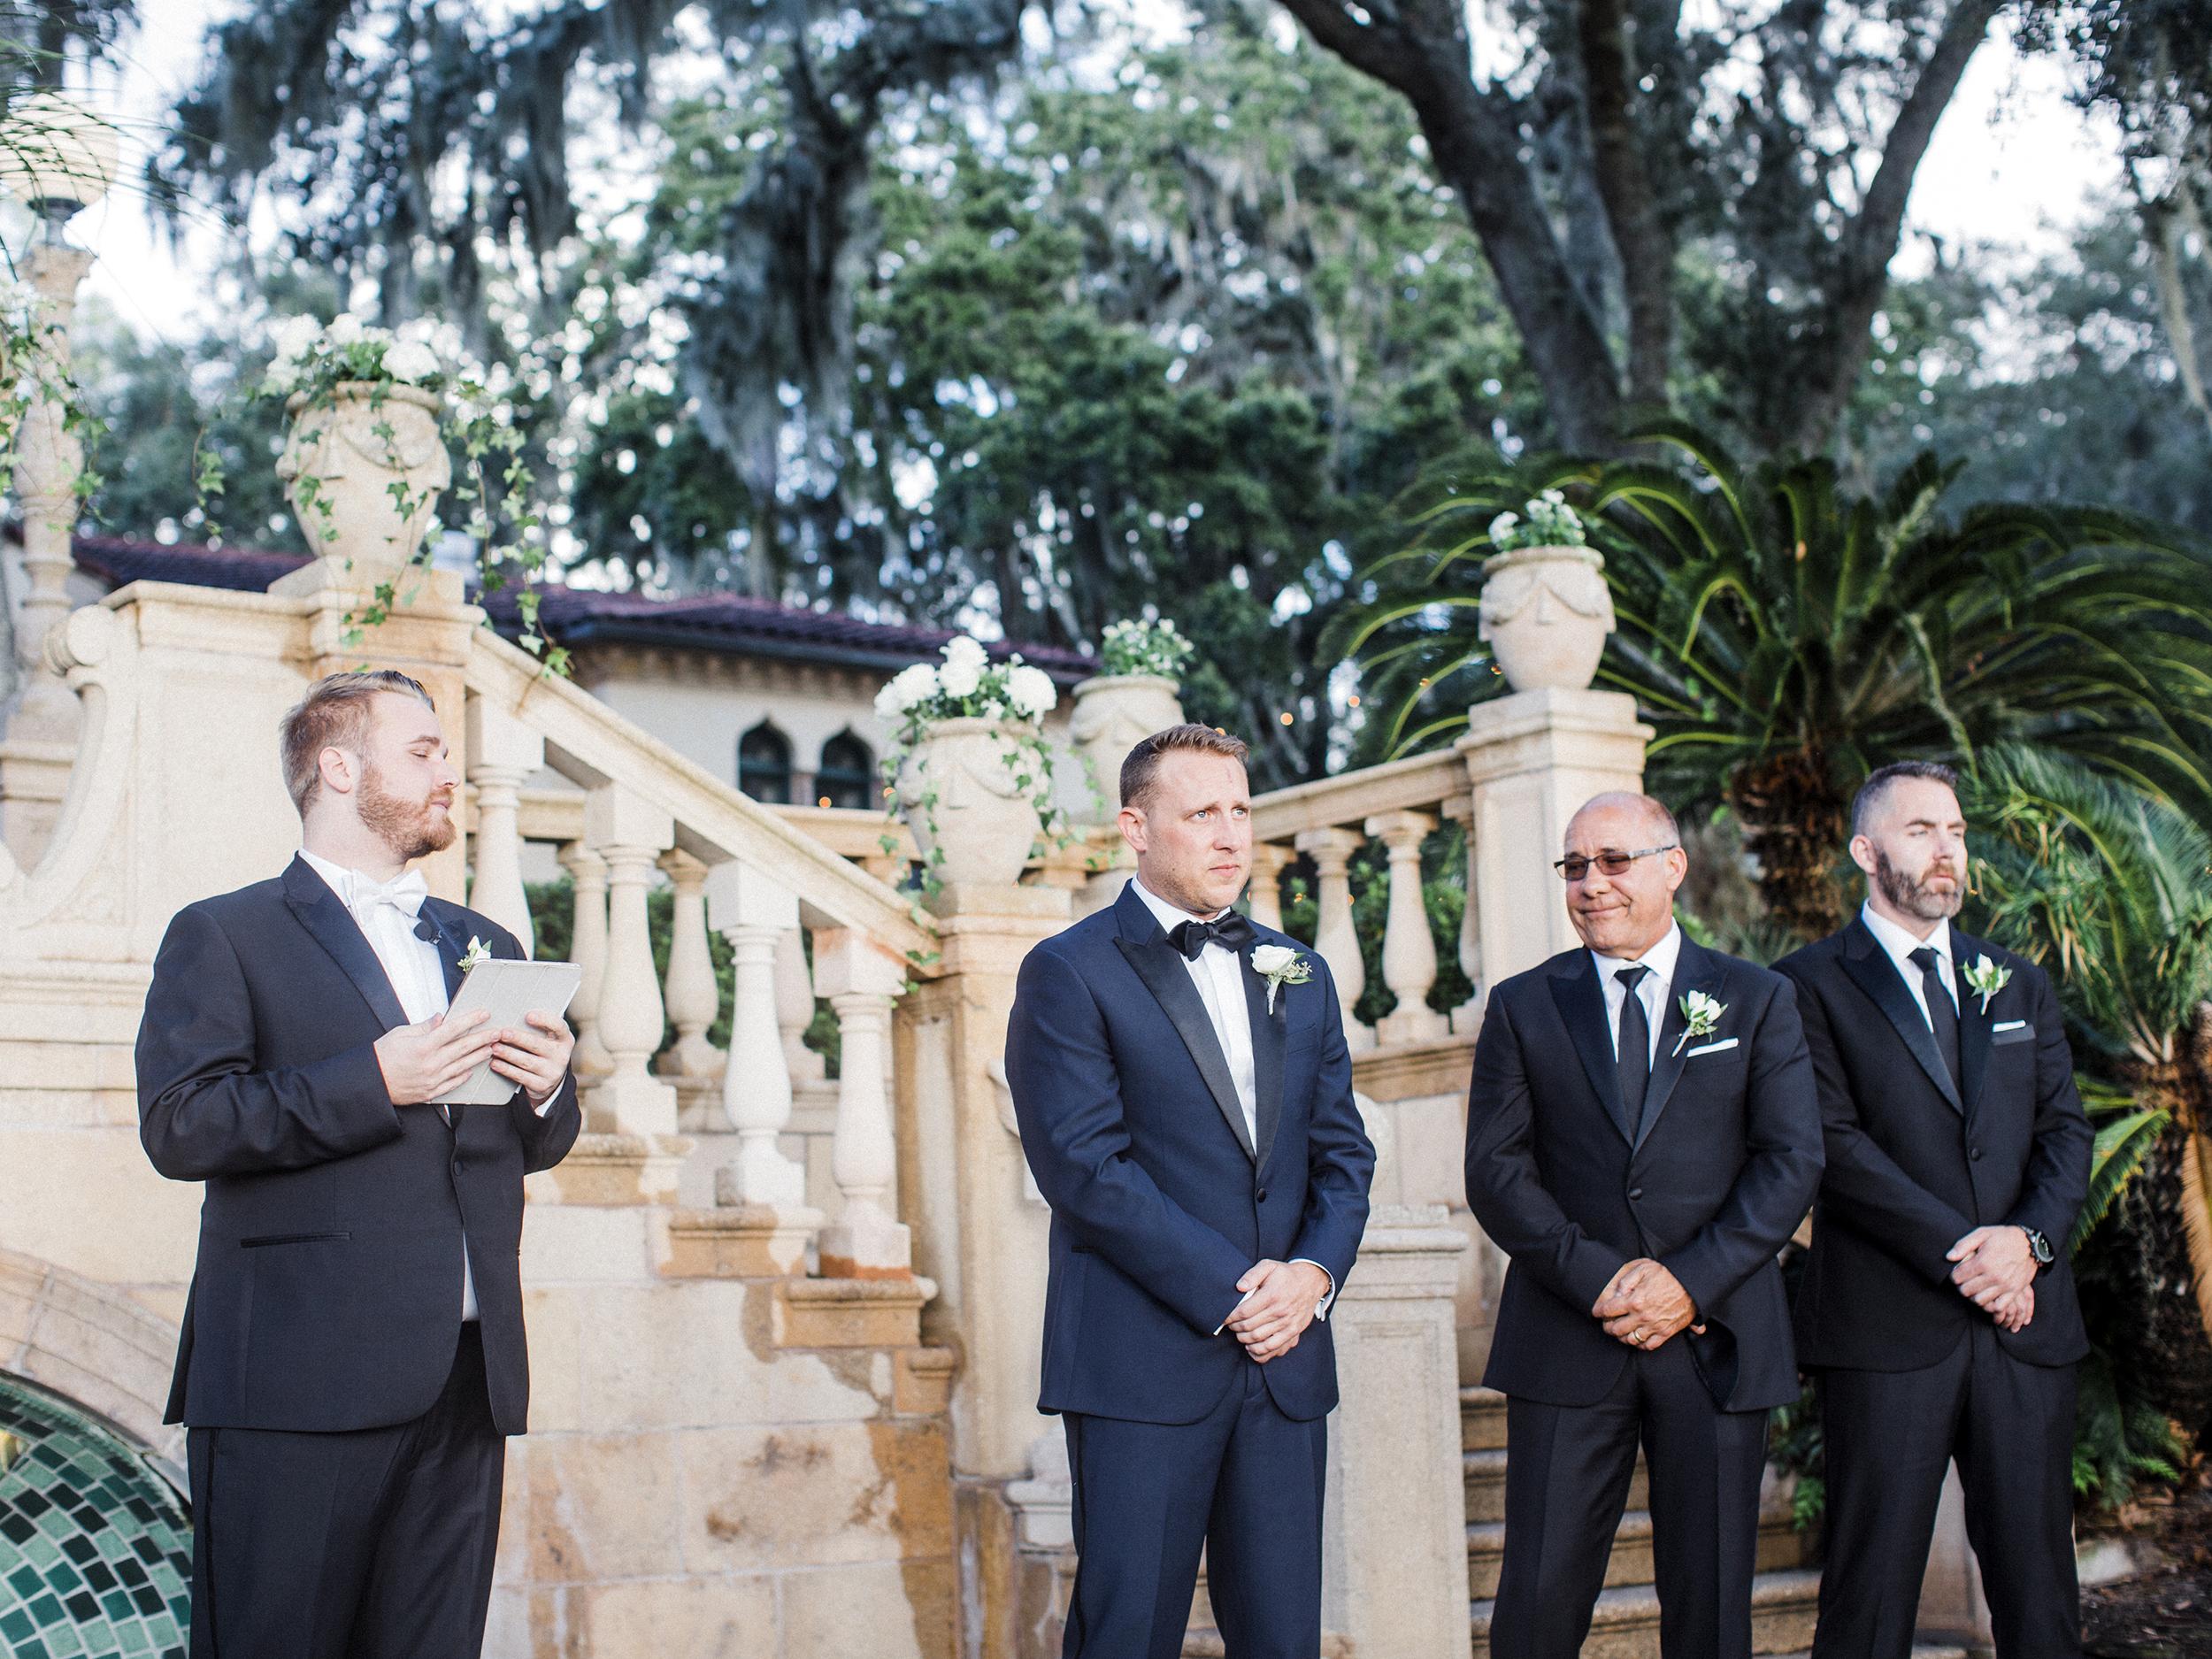 Lisa Silva Photography- Jacksonville, Florida Fine Art Film Wedding Photography Epping Forrest Yacht Club 38.jpg